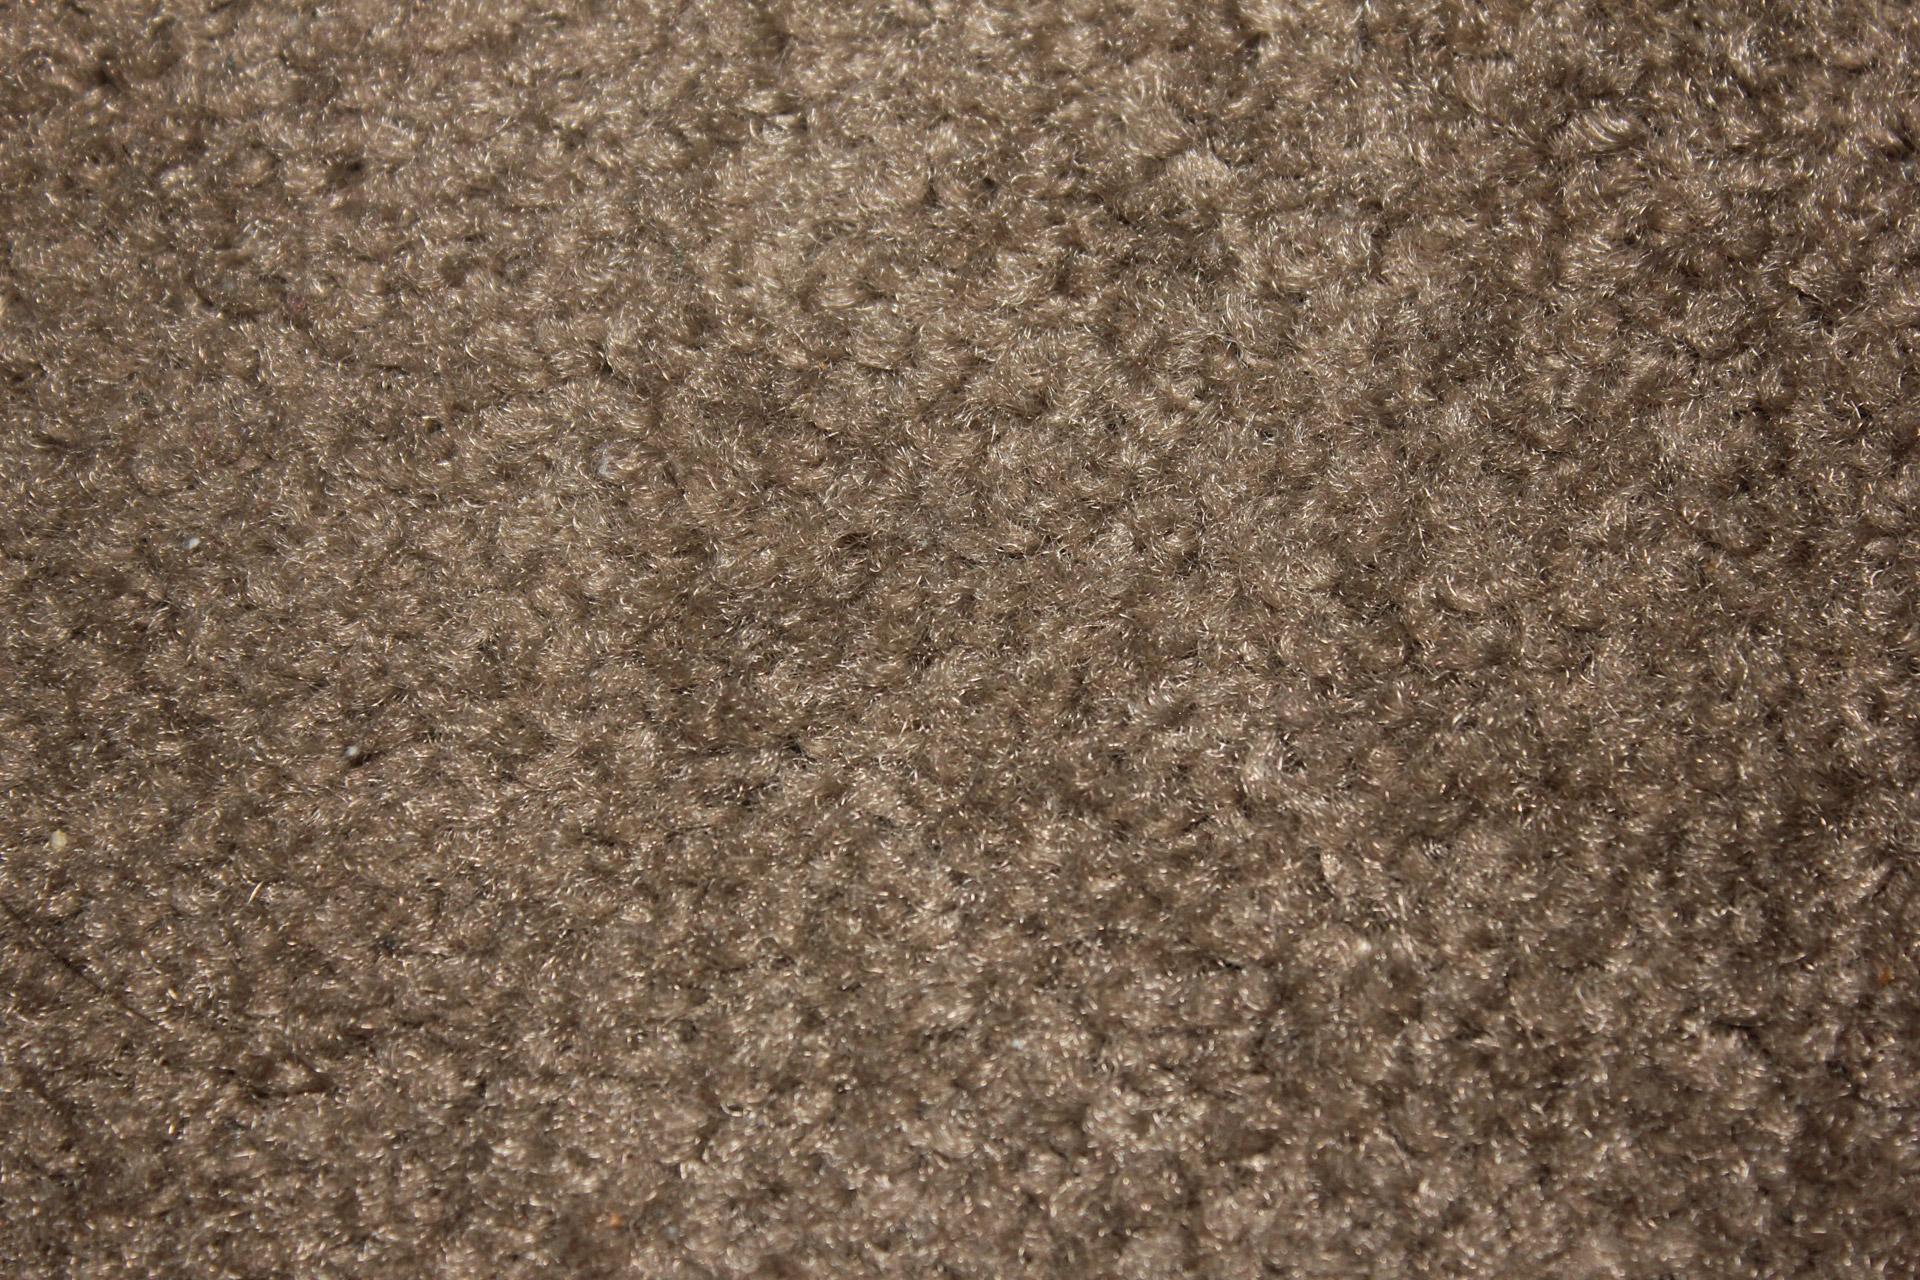 carpet texture QQMMSYP